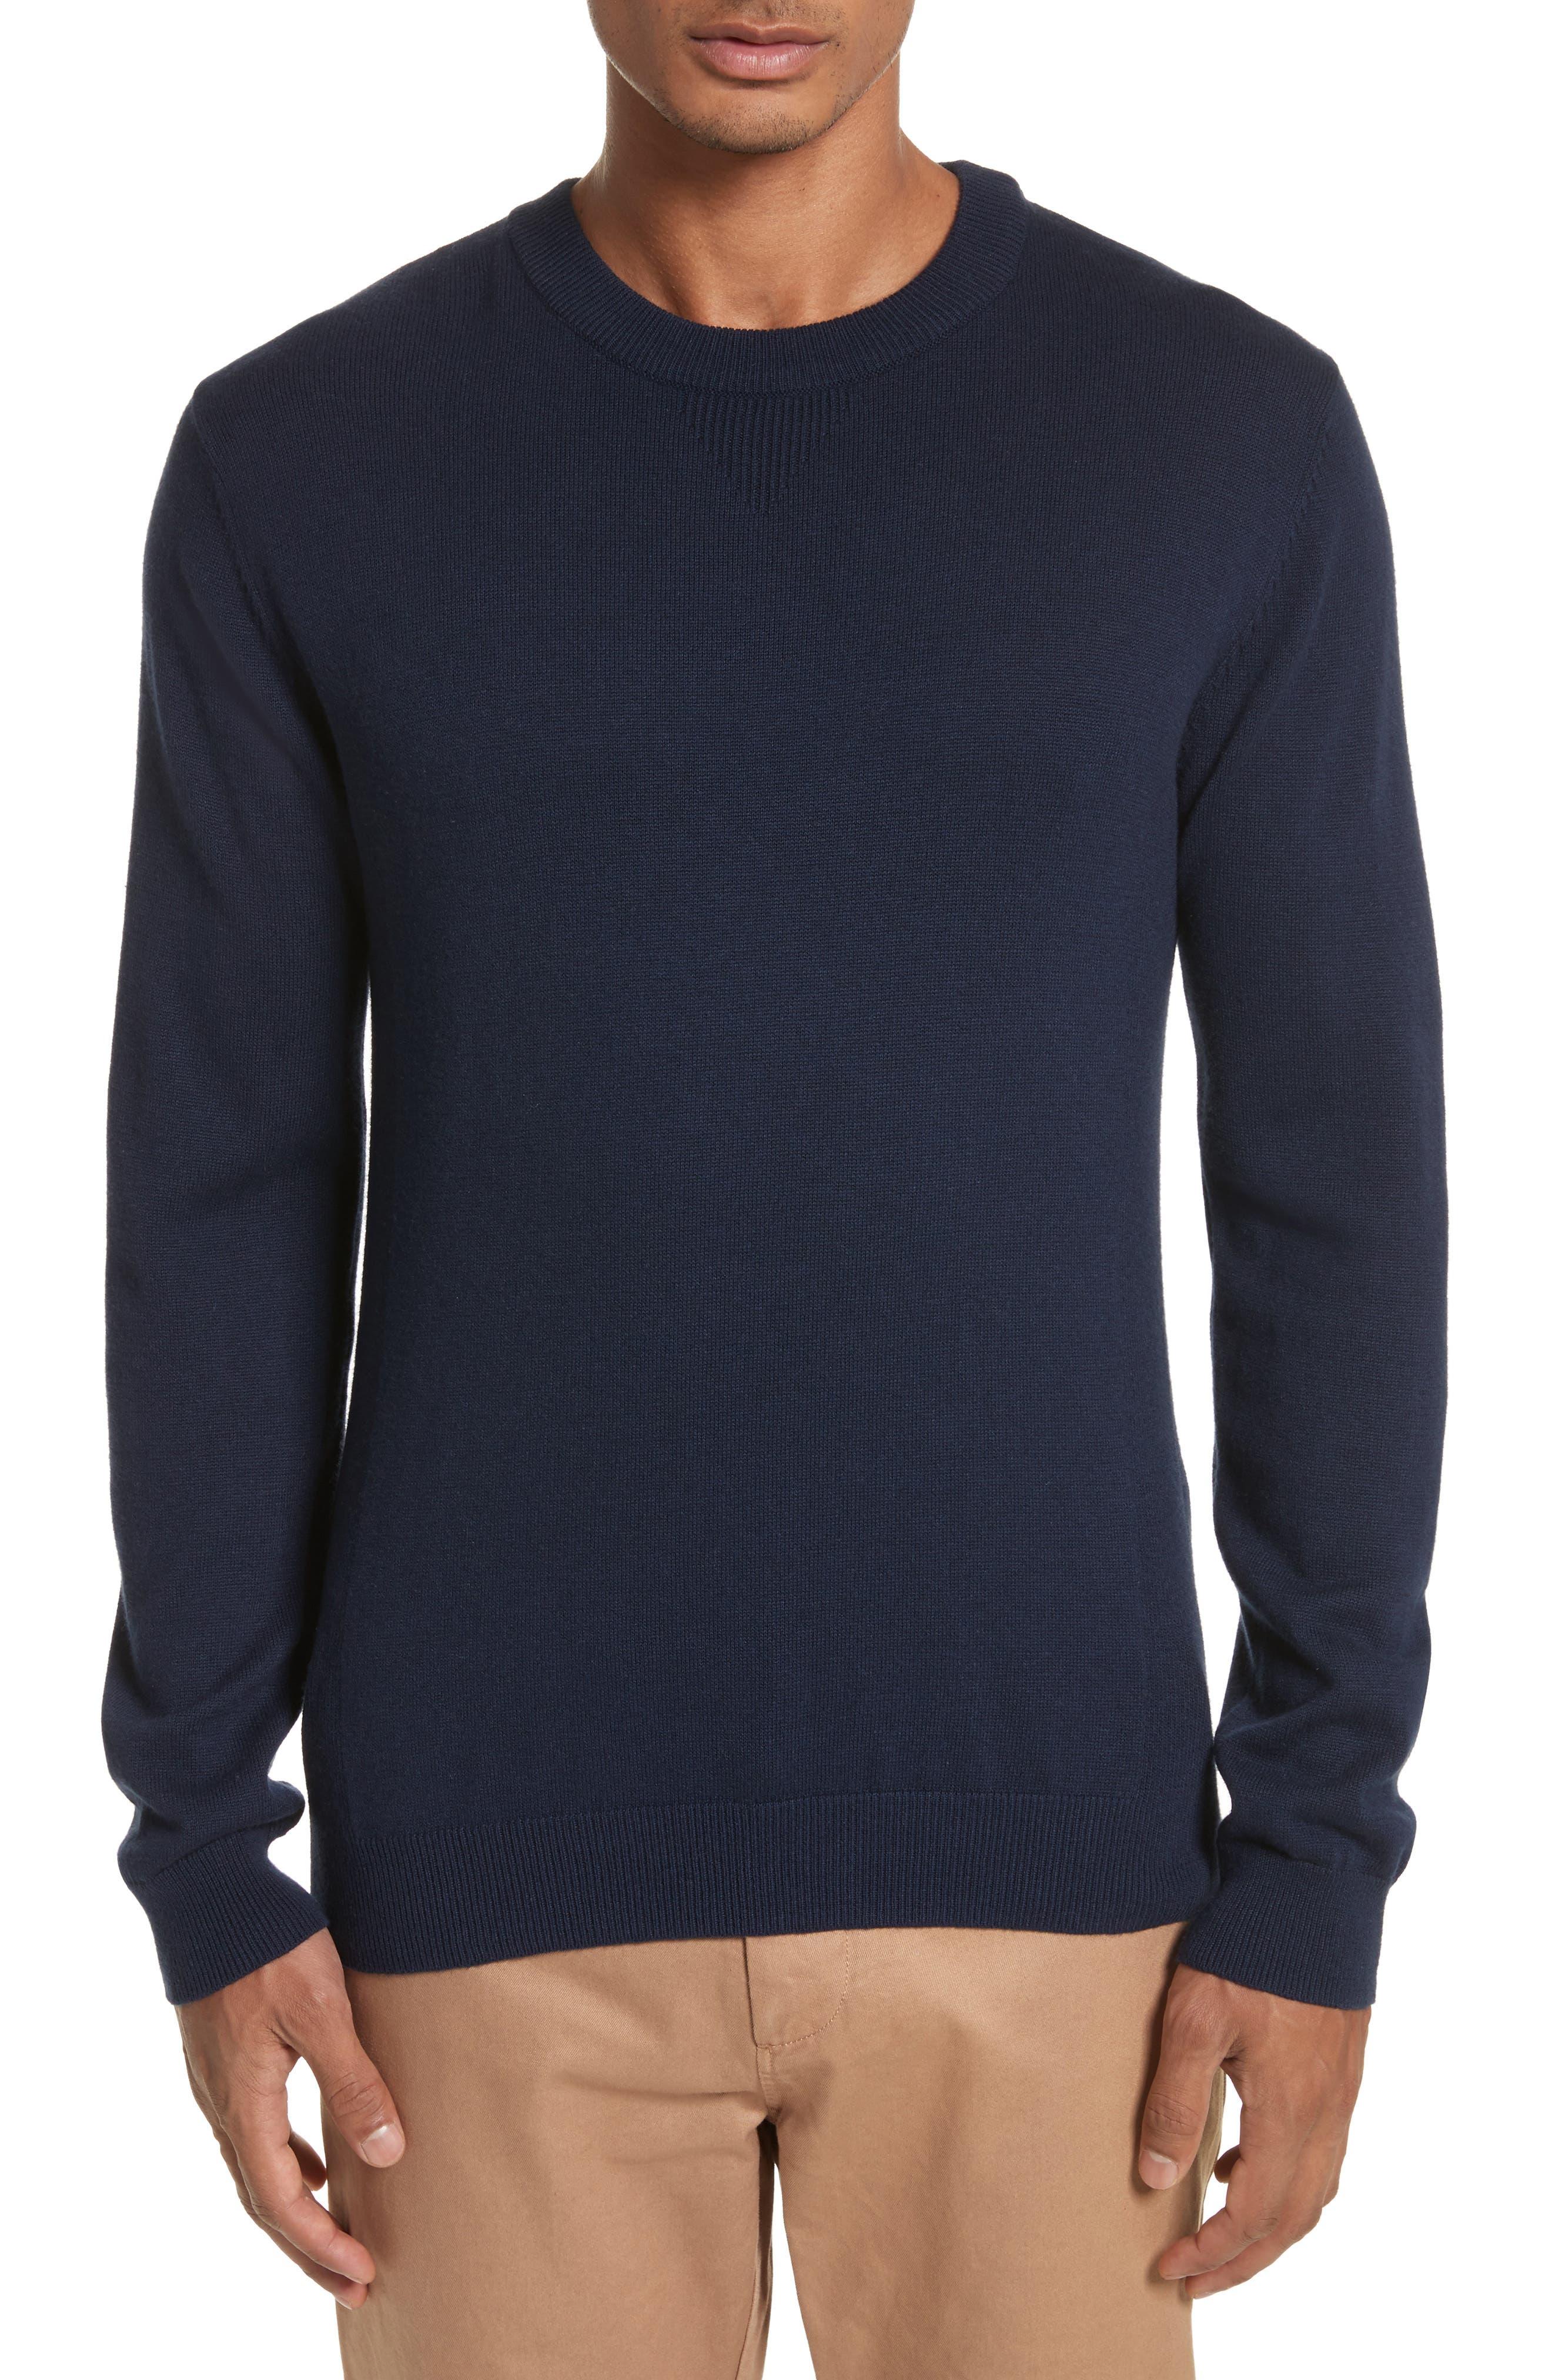 Main Image - Saturdays NYC Everyday Classic Crewneck Sweater